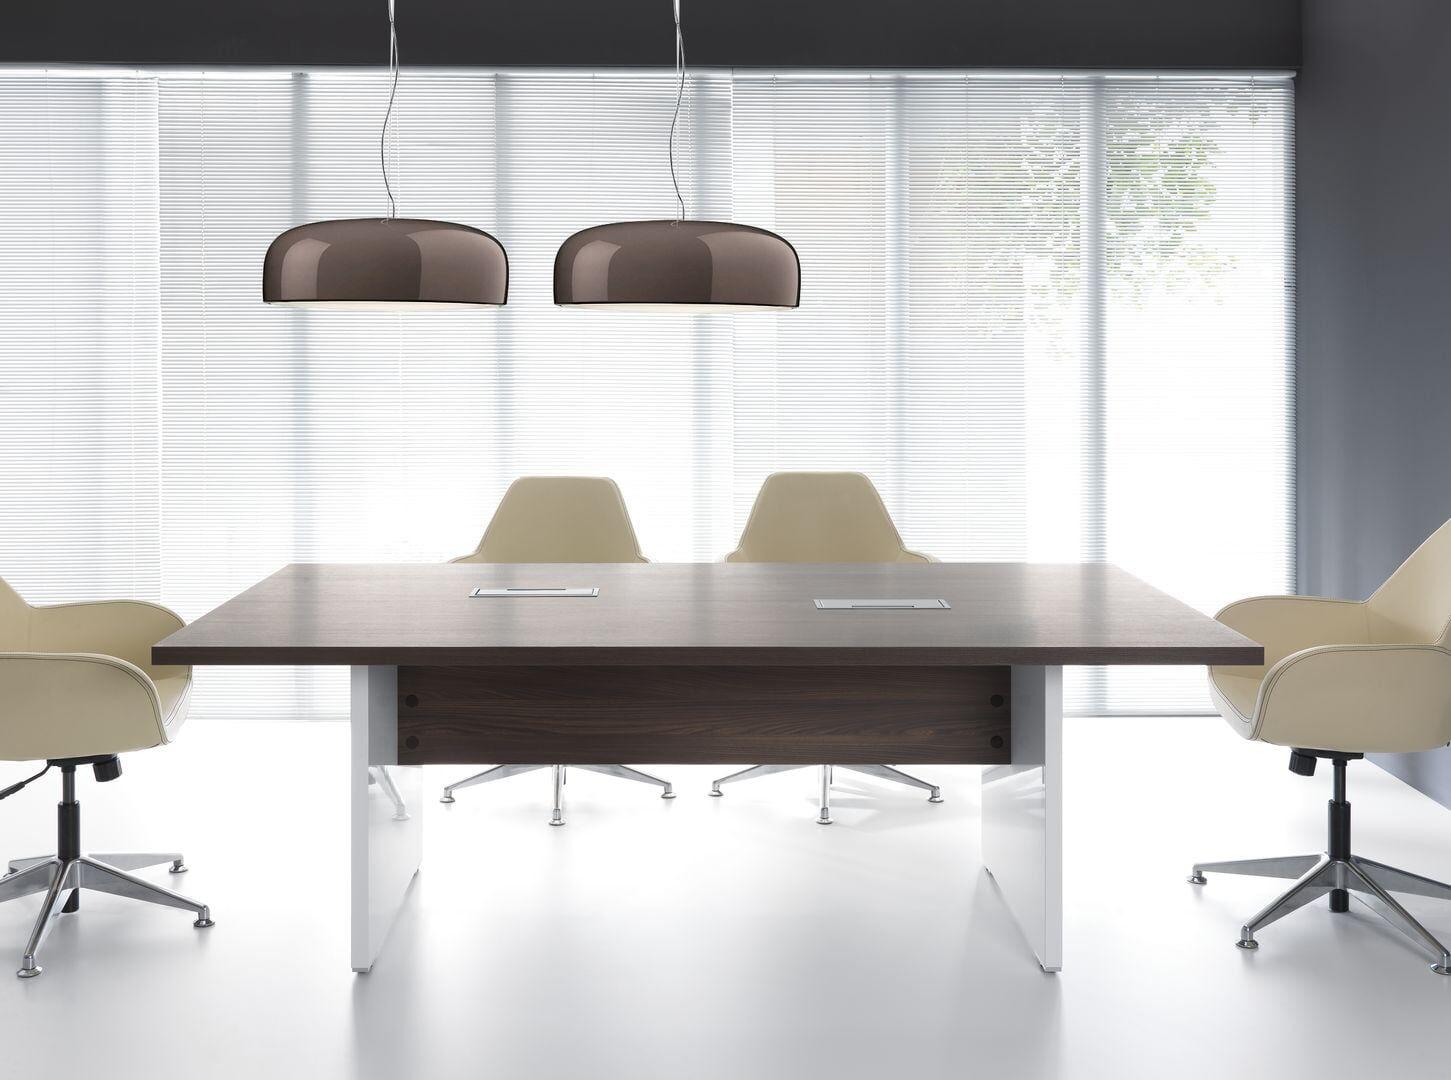 Mito conference table